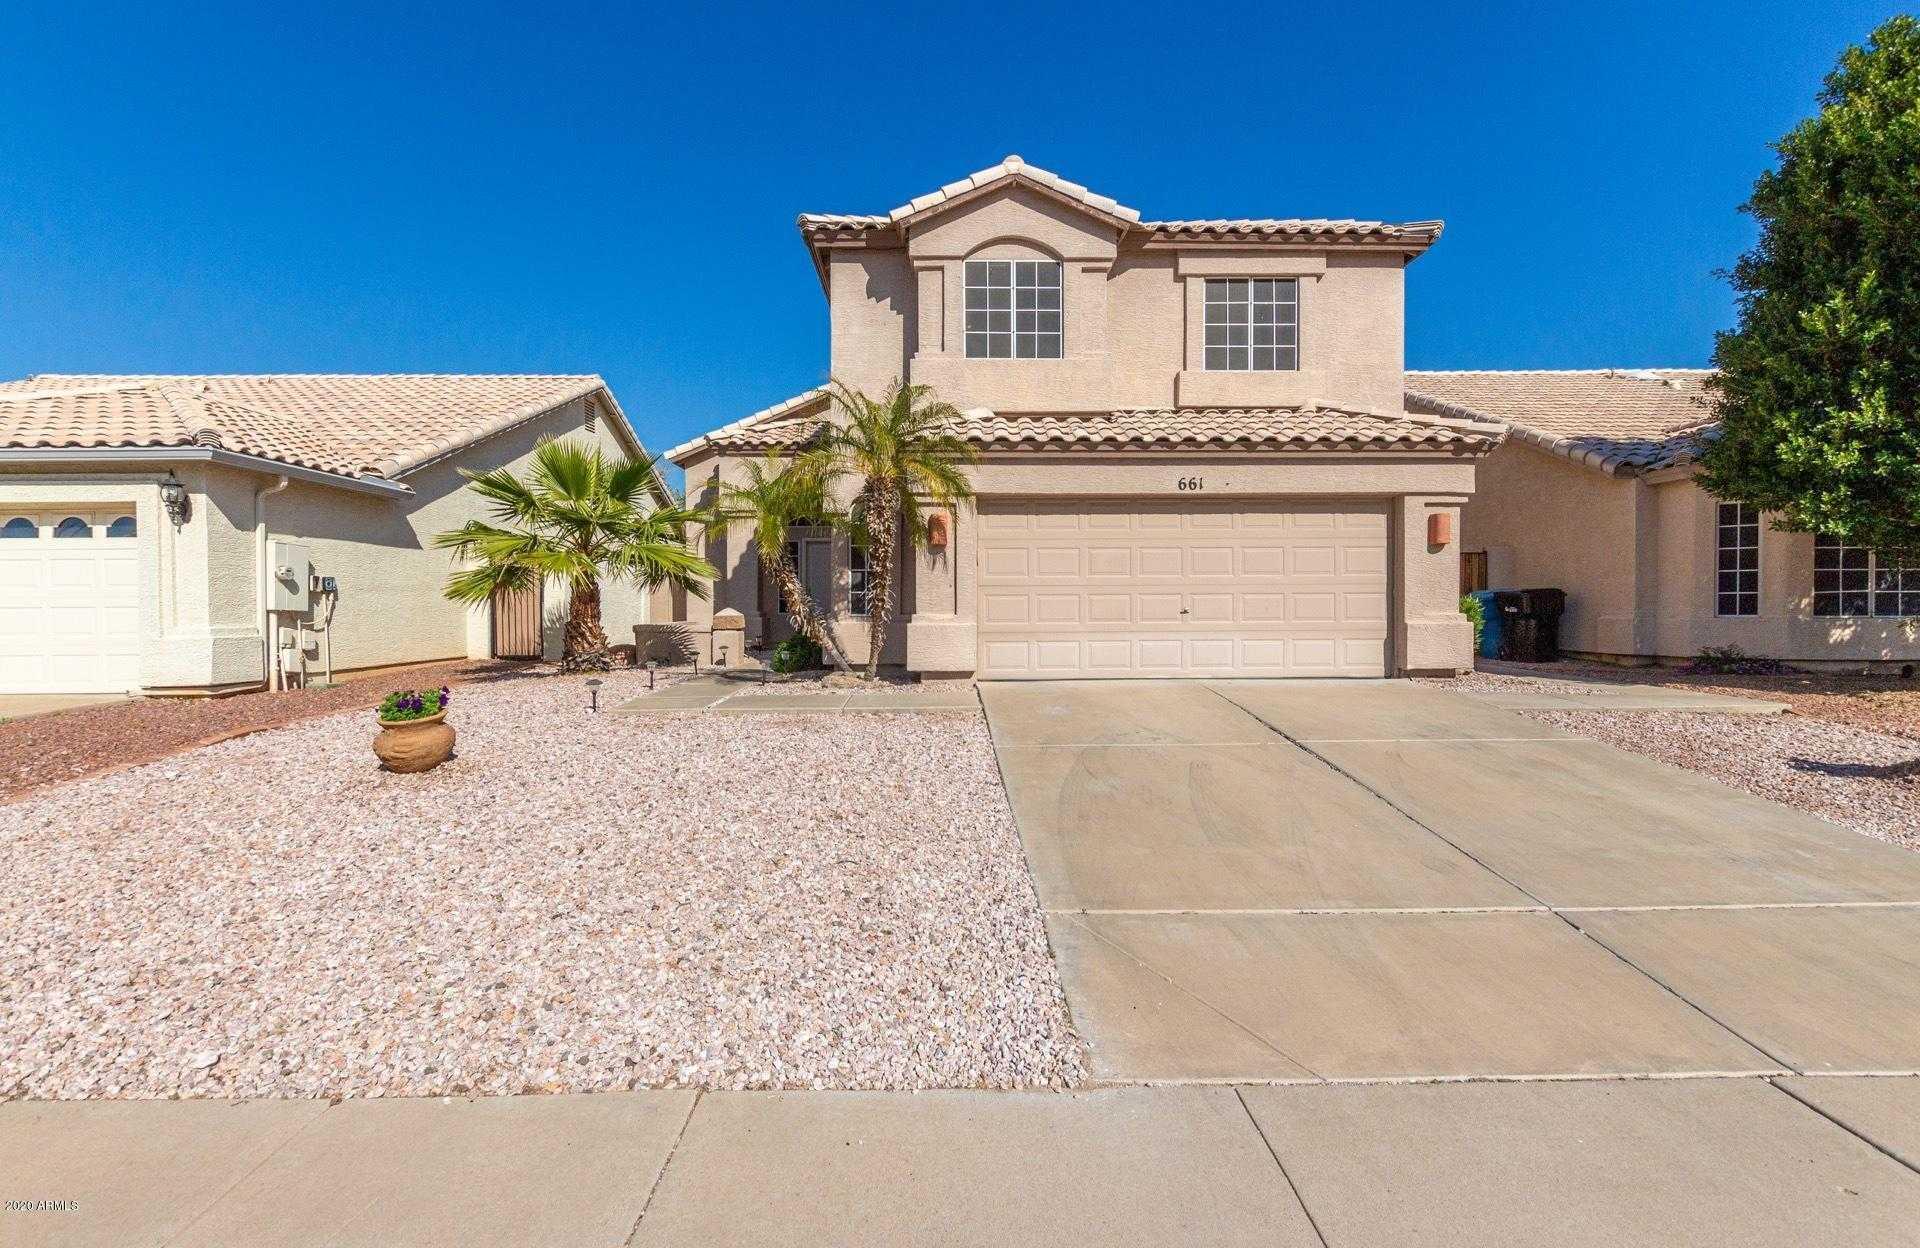 $335,000 - 3Br/3Ba - Home for Sale in El Dorado Lakes Golf Community Tract I, Gilbert